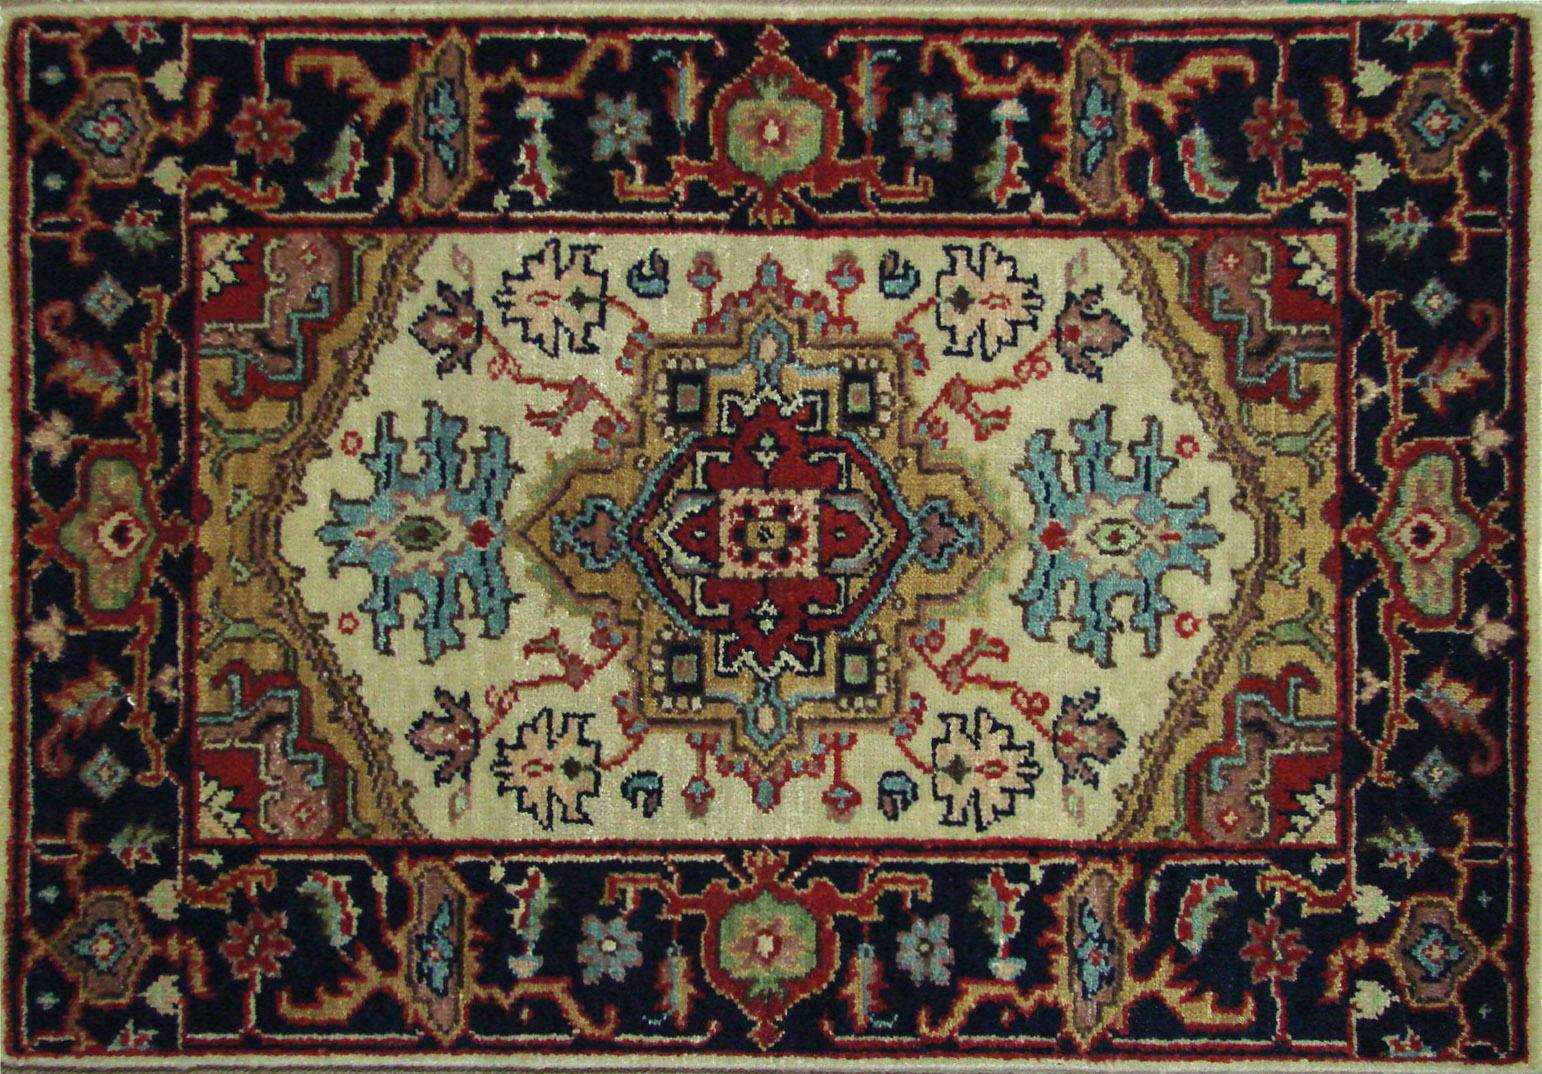 2X3 Heriz/Serapi Hand Knotted Wool Area Rug - MR021793